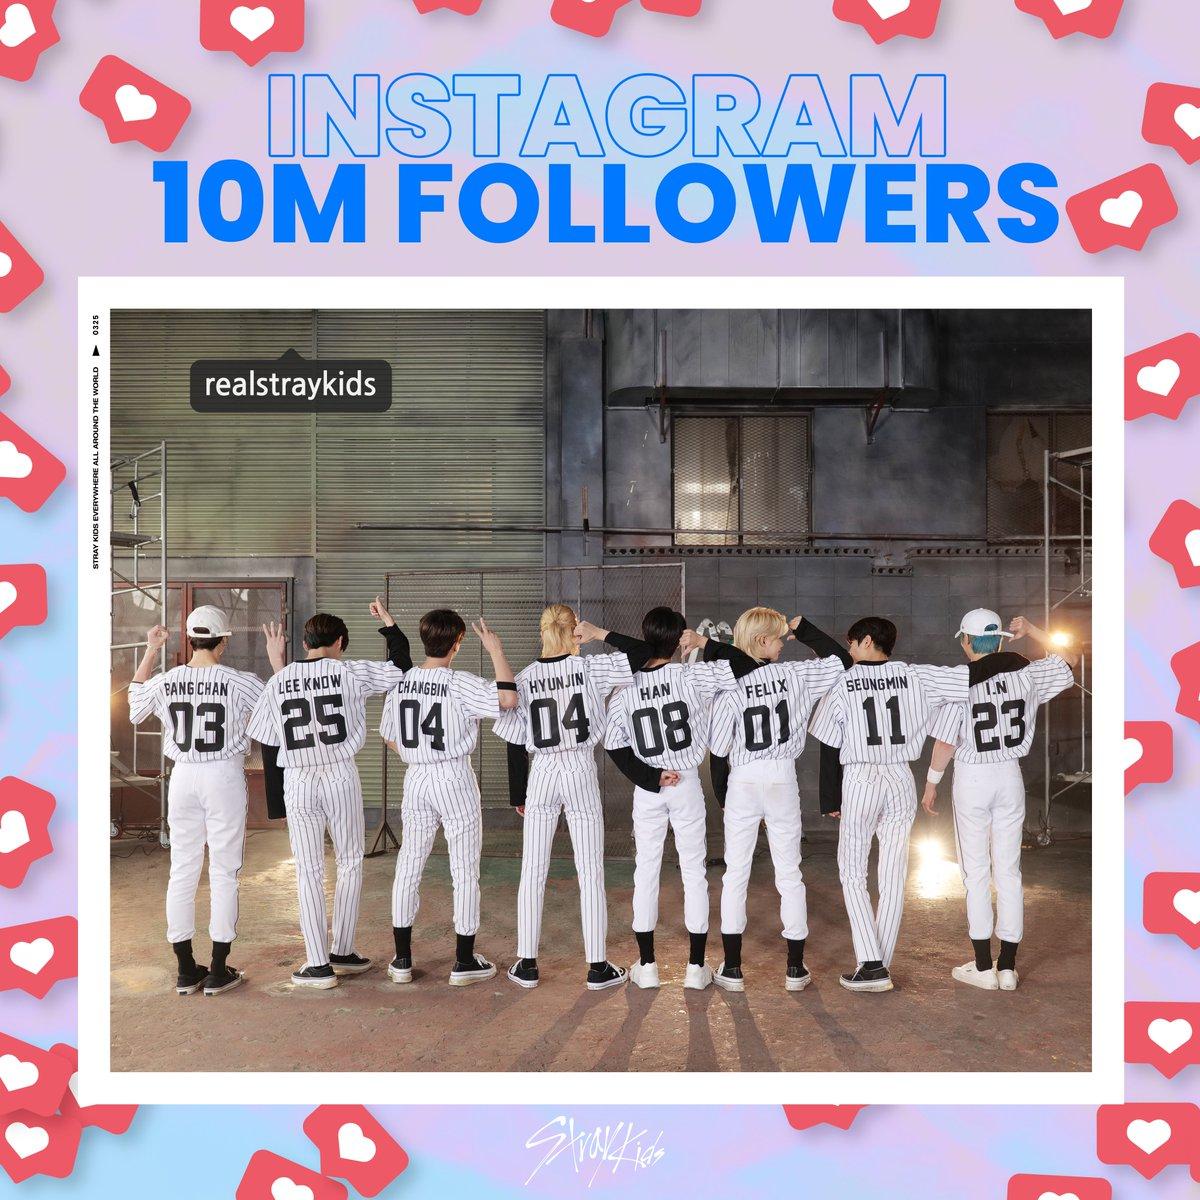 Stray Kids(스트레이 키즈) Official Instagram ⭐10M FOLLOWERS⭐  앞으로도 함께해요, STAY❣ Stay with us, STAY❣    #StrayKids #스트레이키즈 #YouMakeStrayKidsStay #RealStrayKids10M